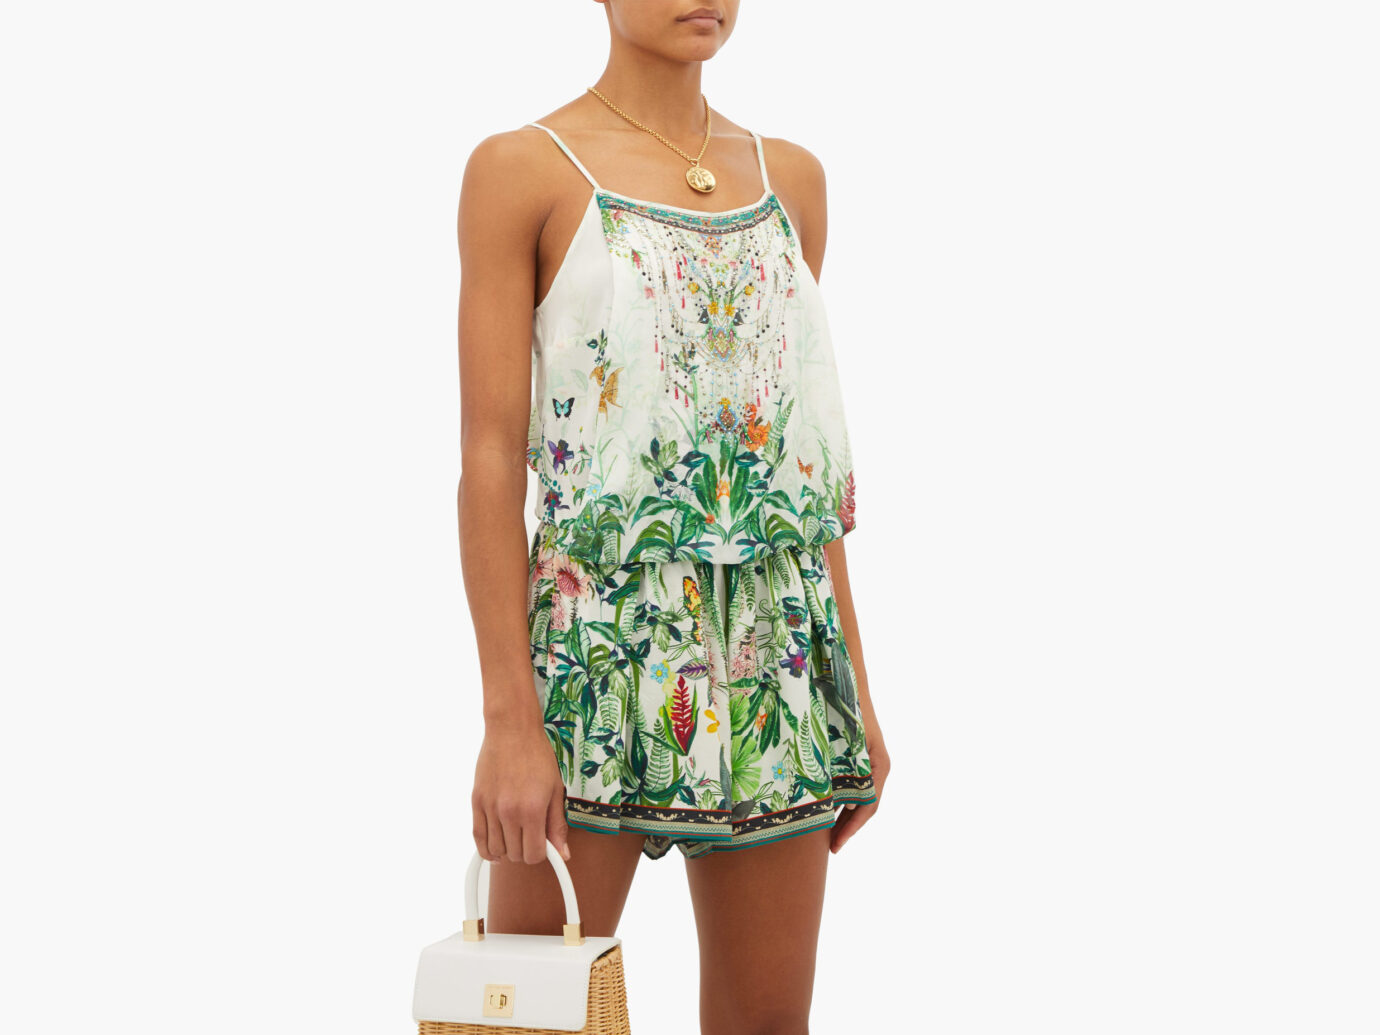 Camilla Daintree Darling Rainforest-Print Playsuit